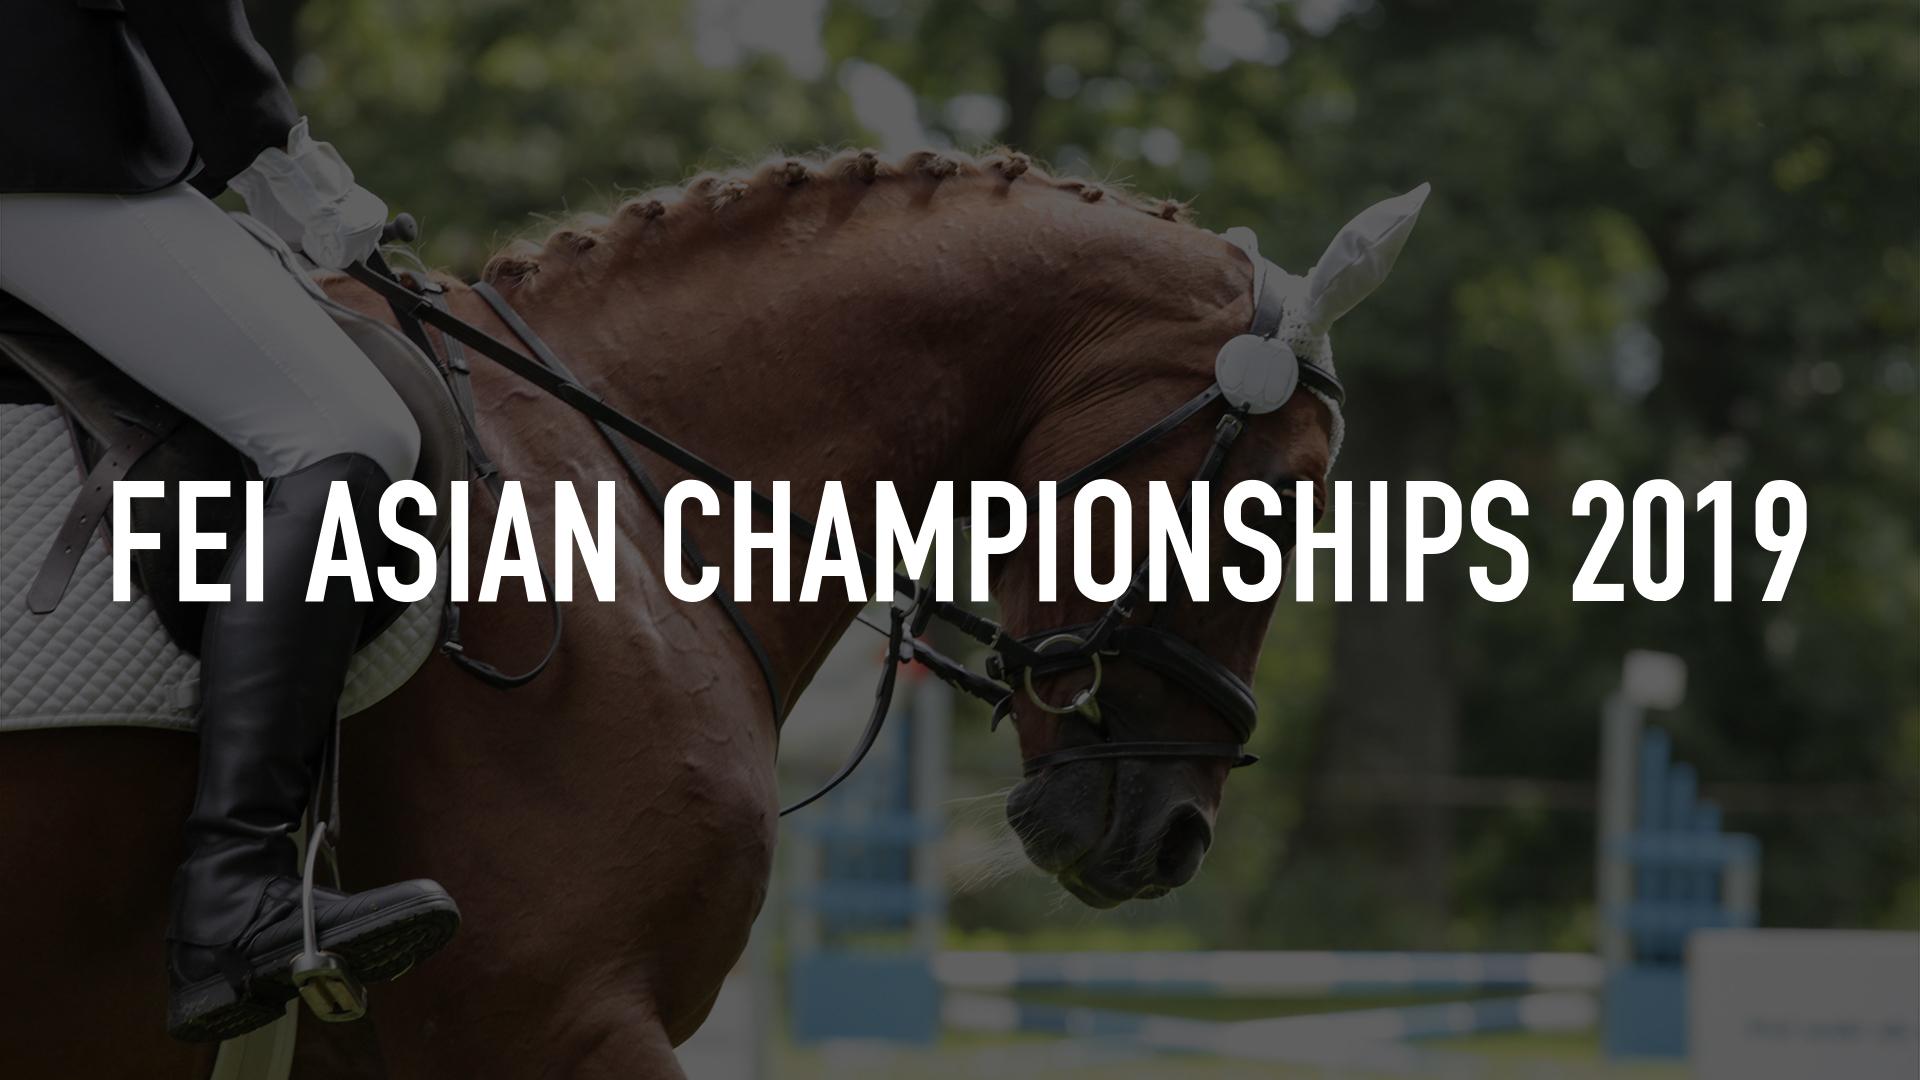 FEI Asian Championships 2019